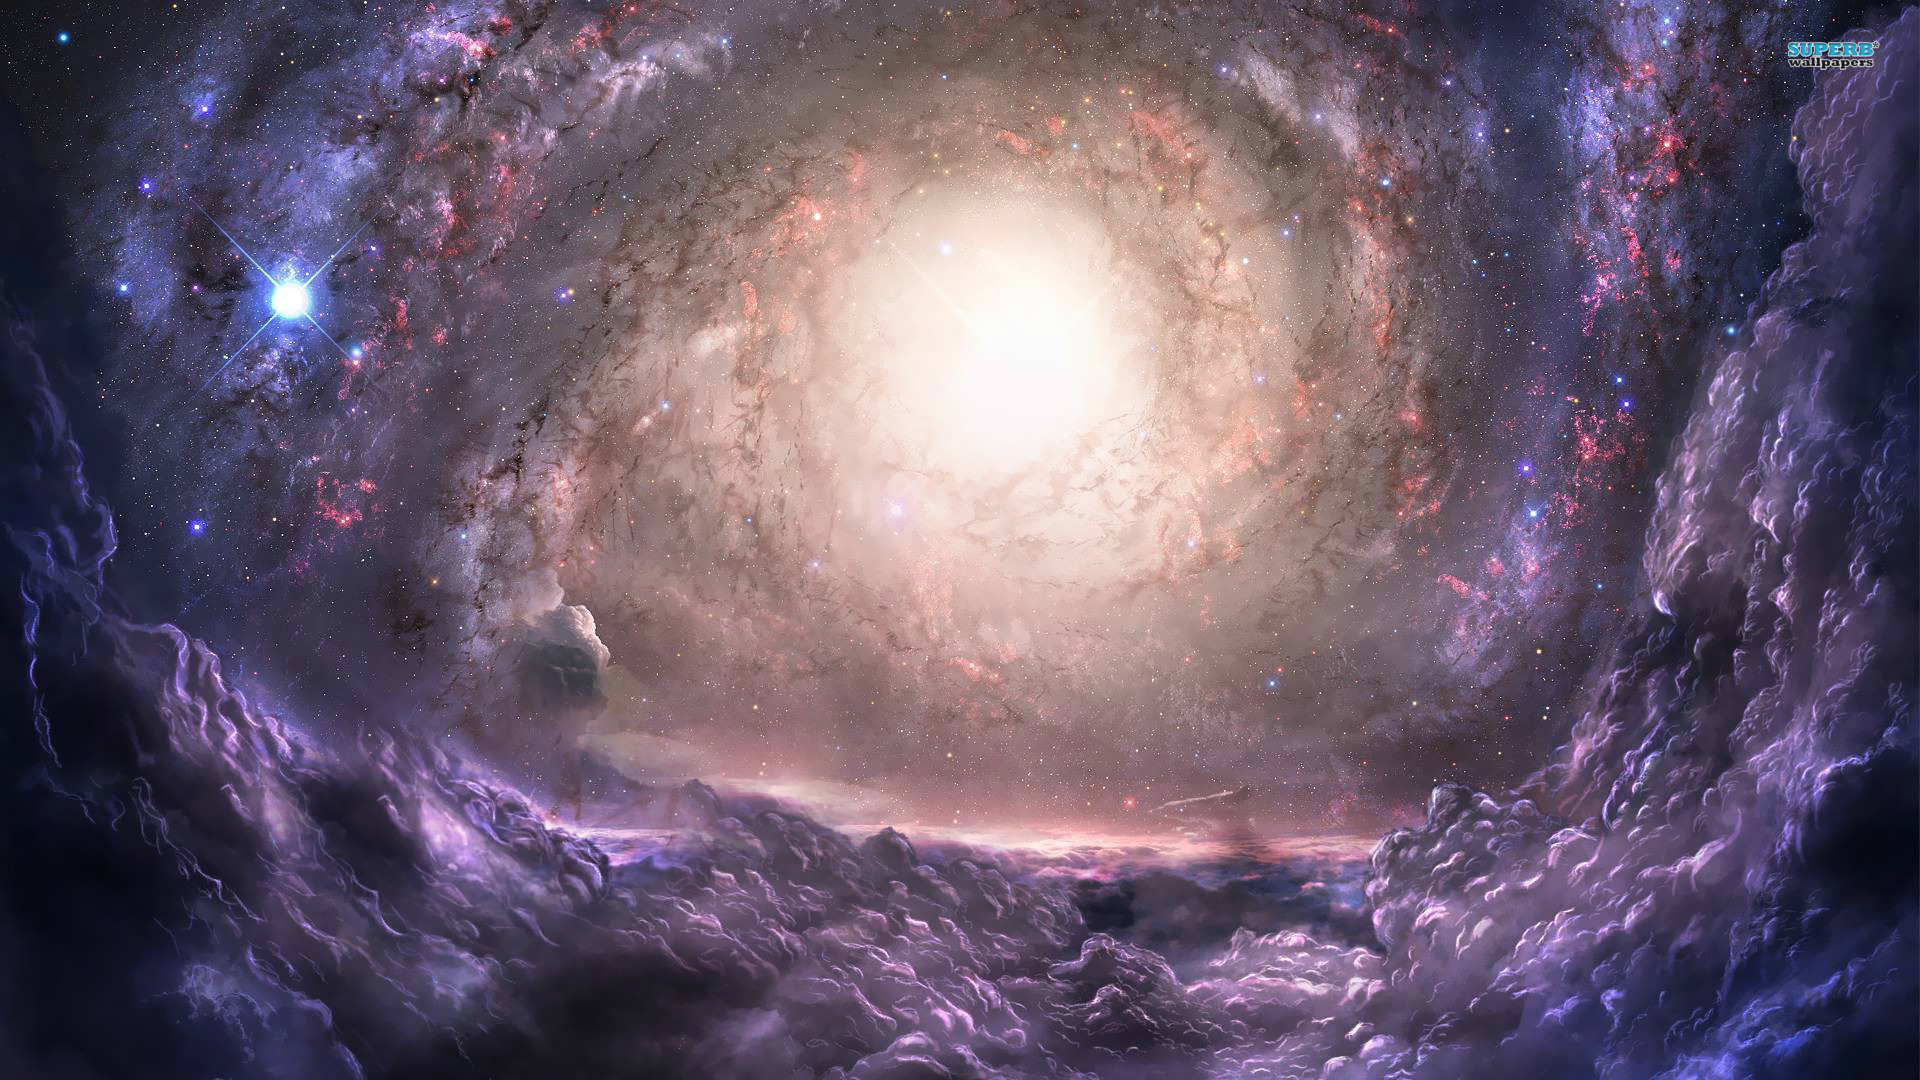 Orion Nebula High Definition Wallpaper 1920x1080